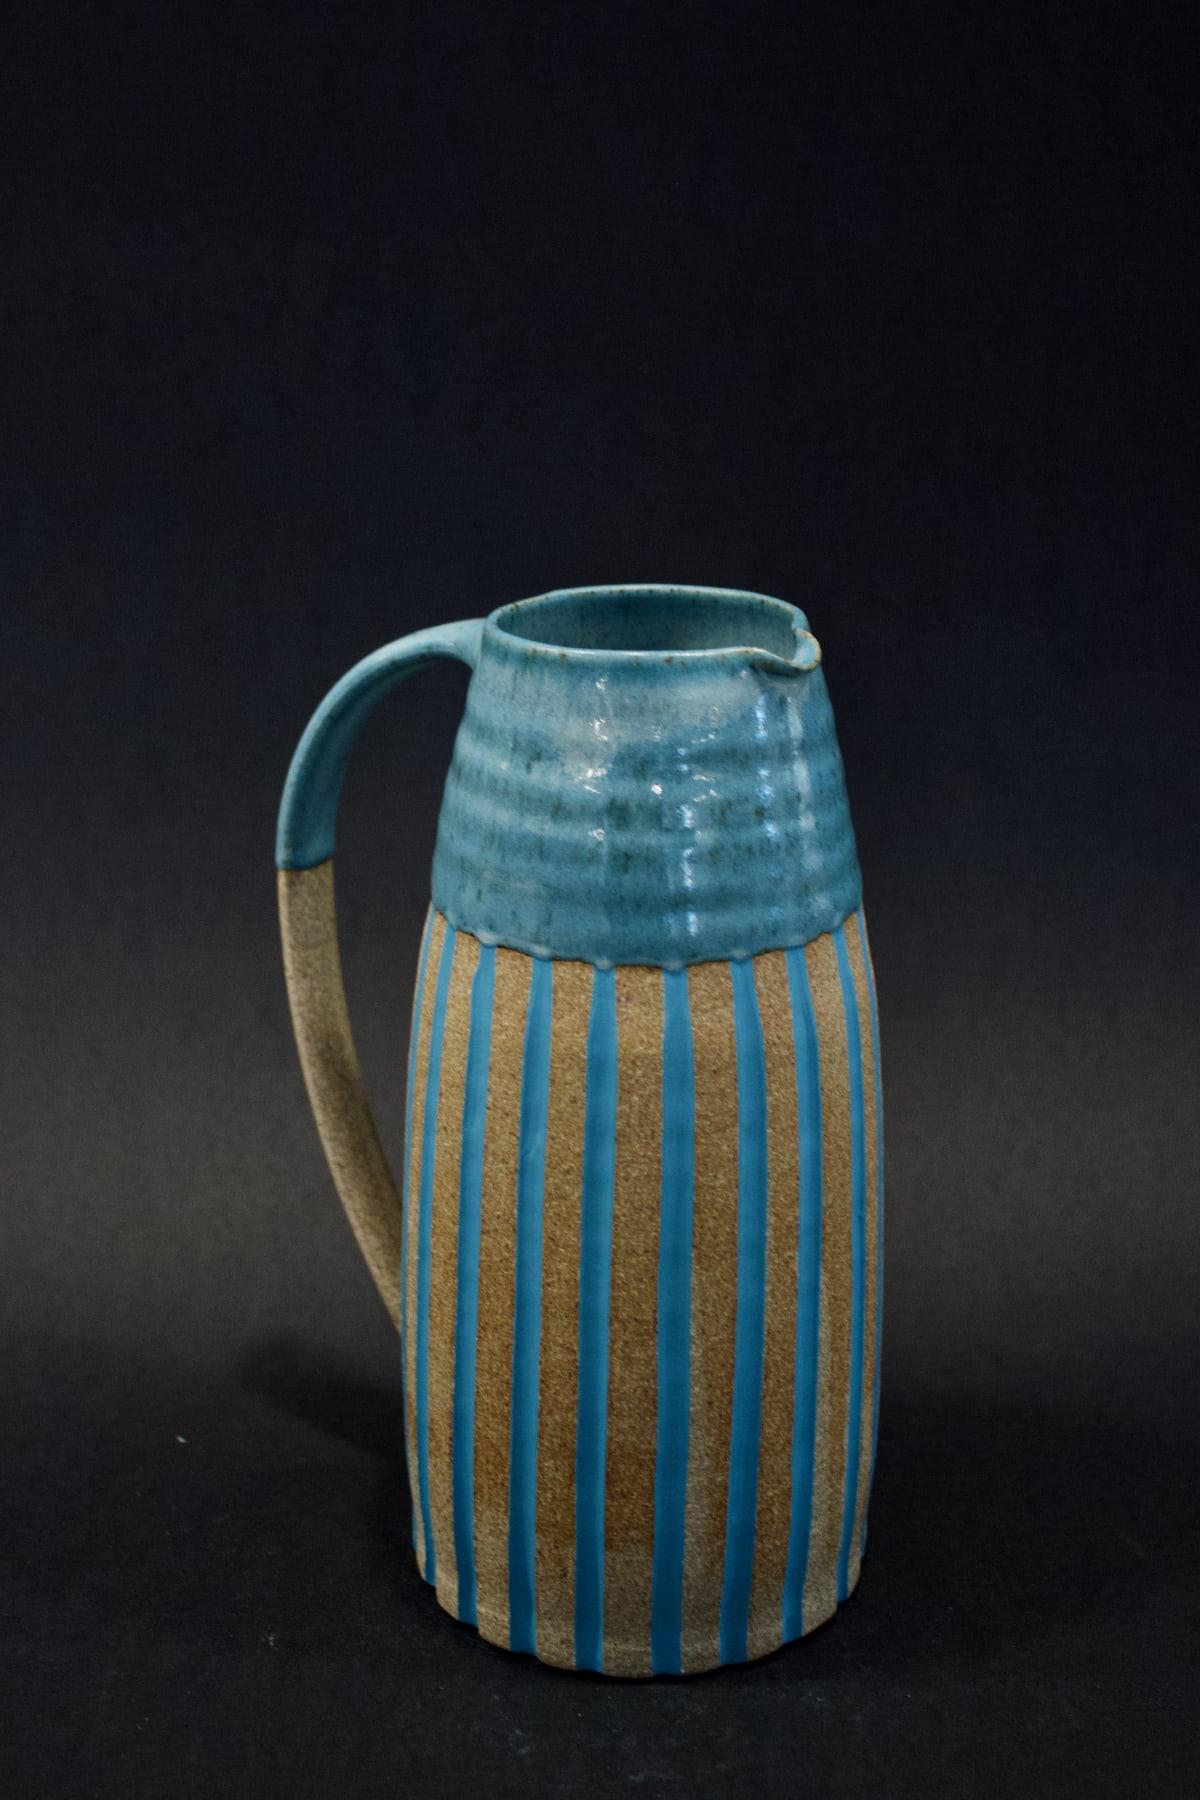 Kate Garwood Green Jug, 2019 Ceramic 20 x 15 x 10 cm 7 7/8 x 5 7/8 x 4 in